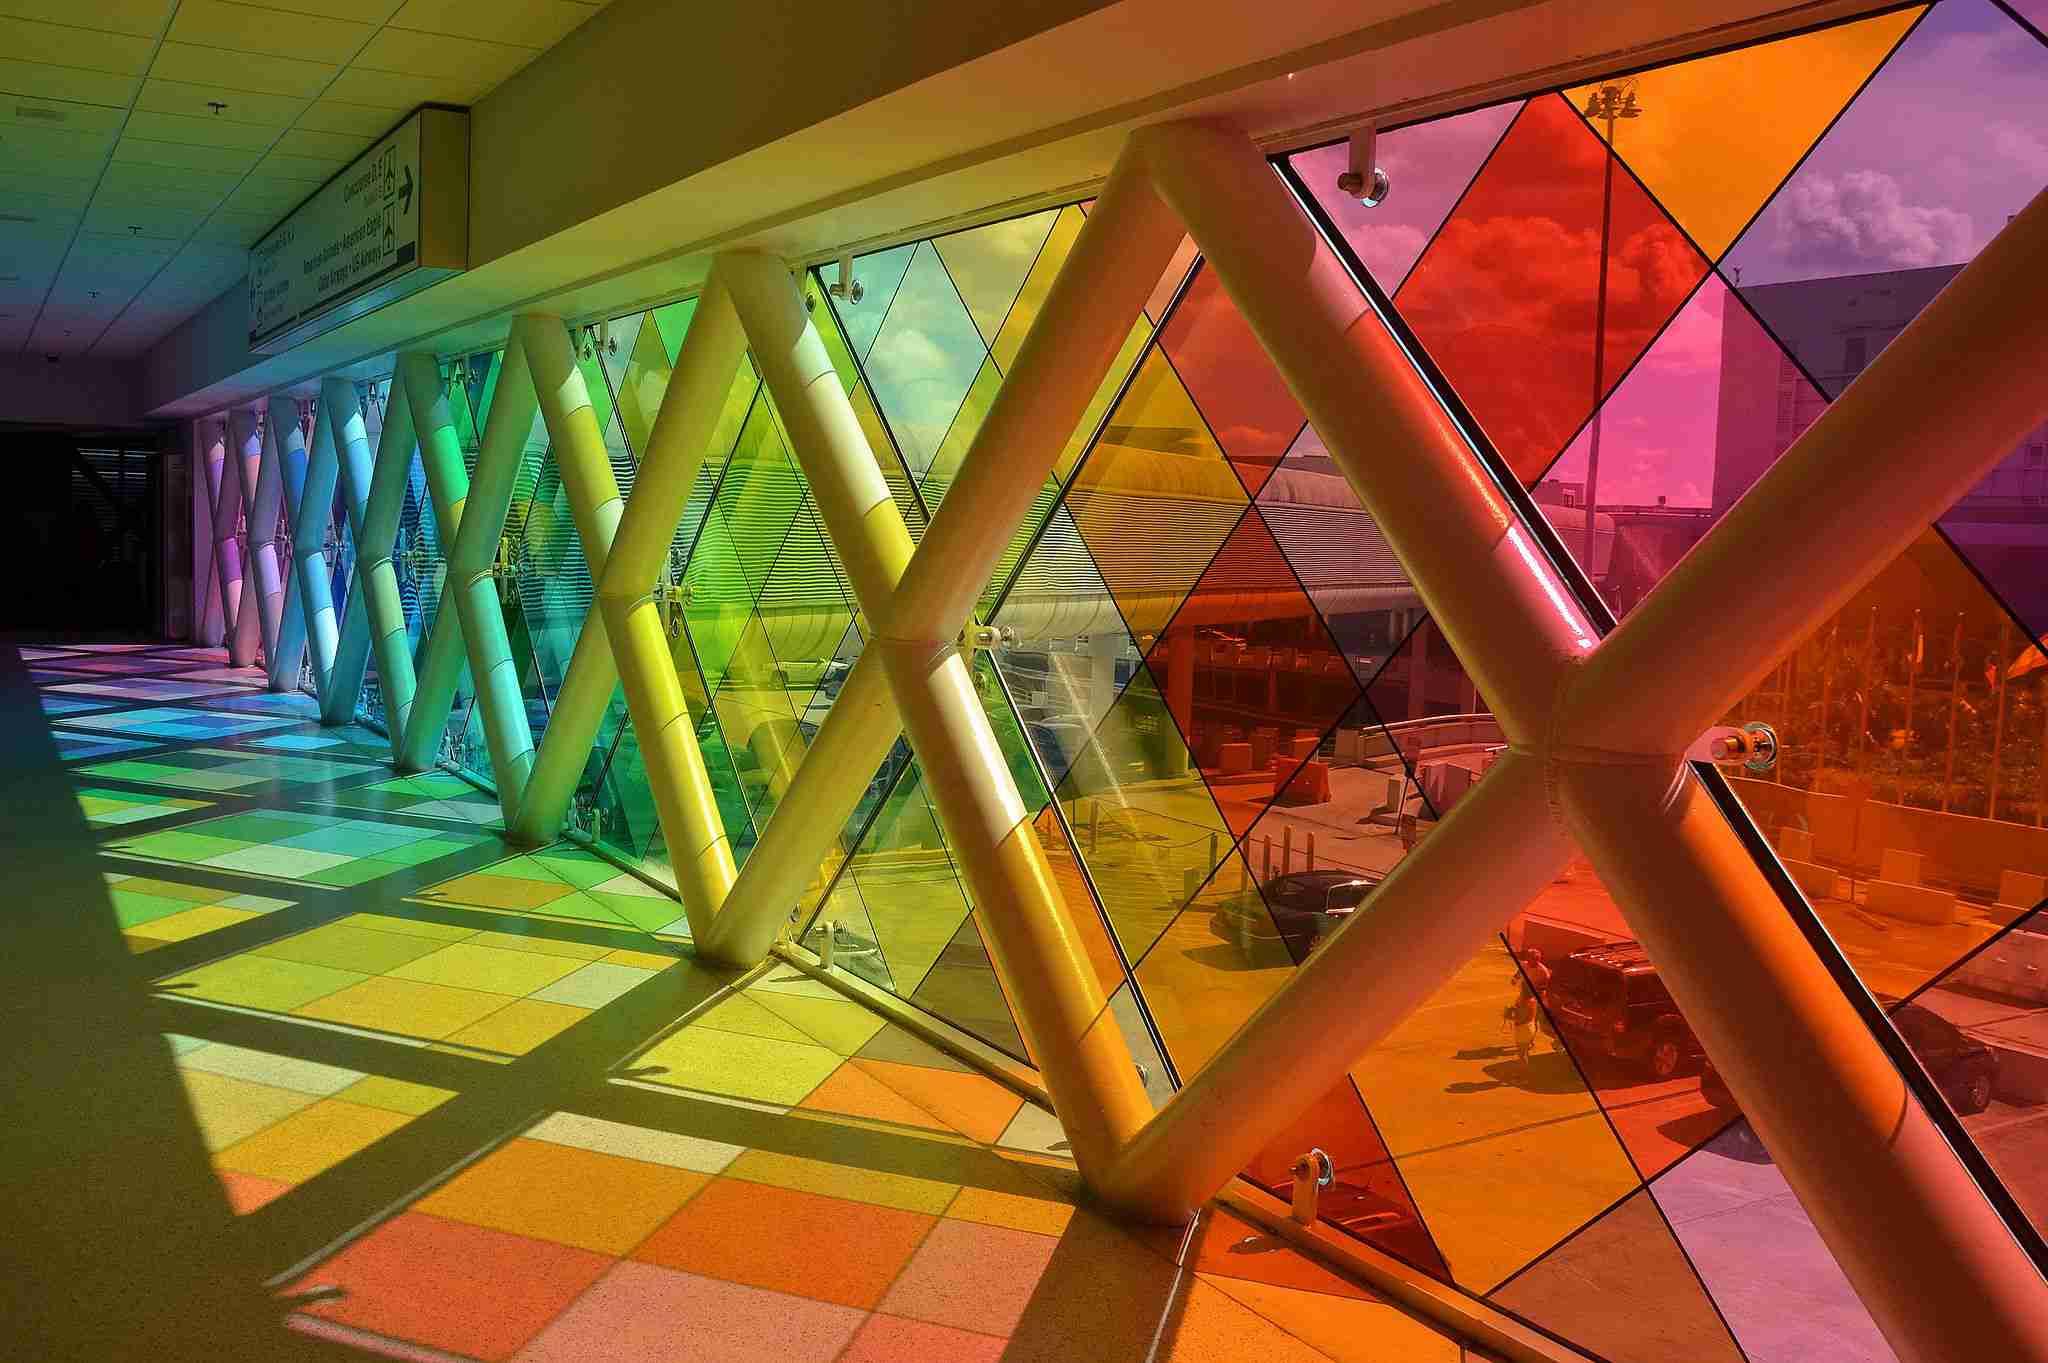 Rainbow Pathway, Miami International Airport